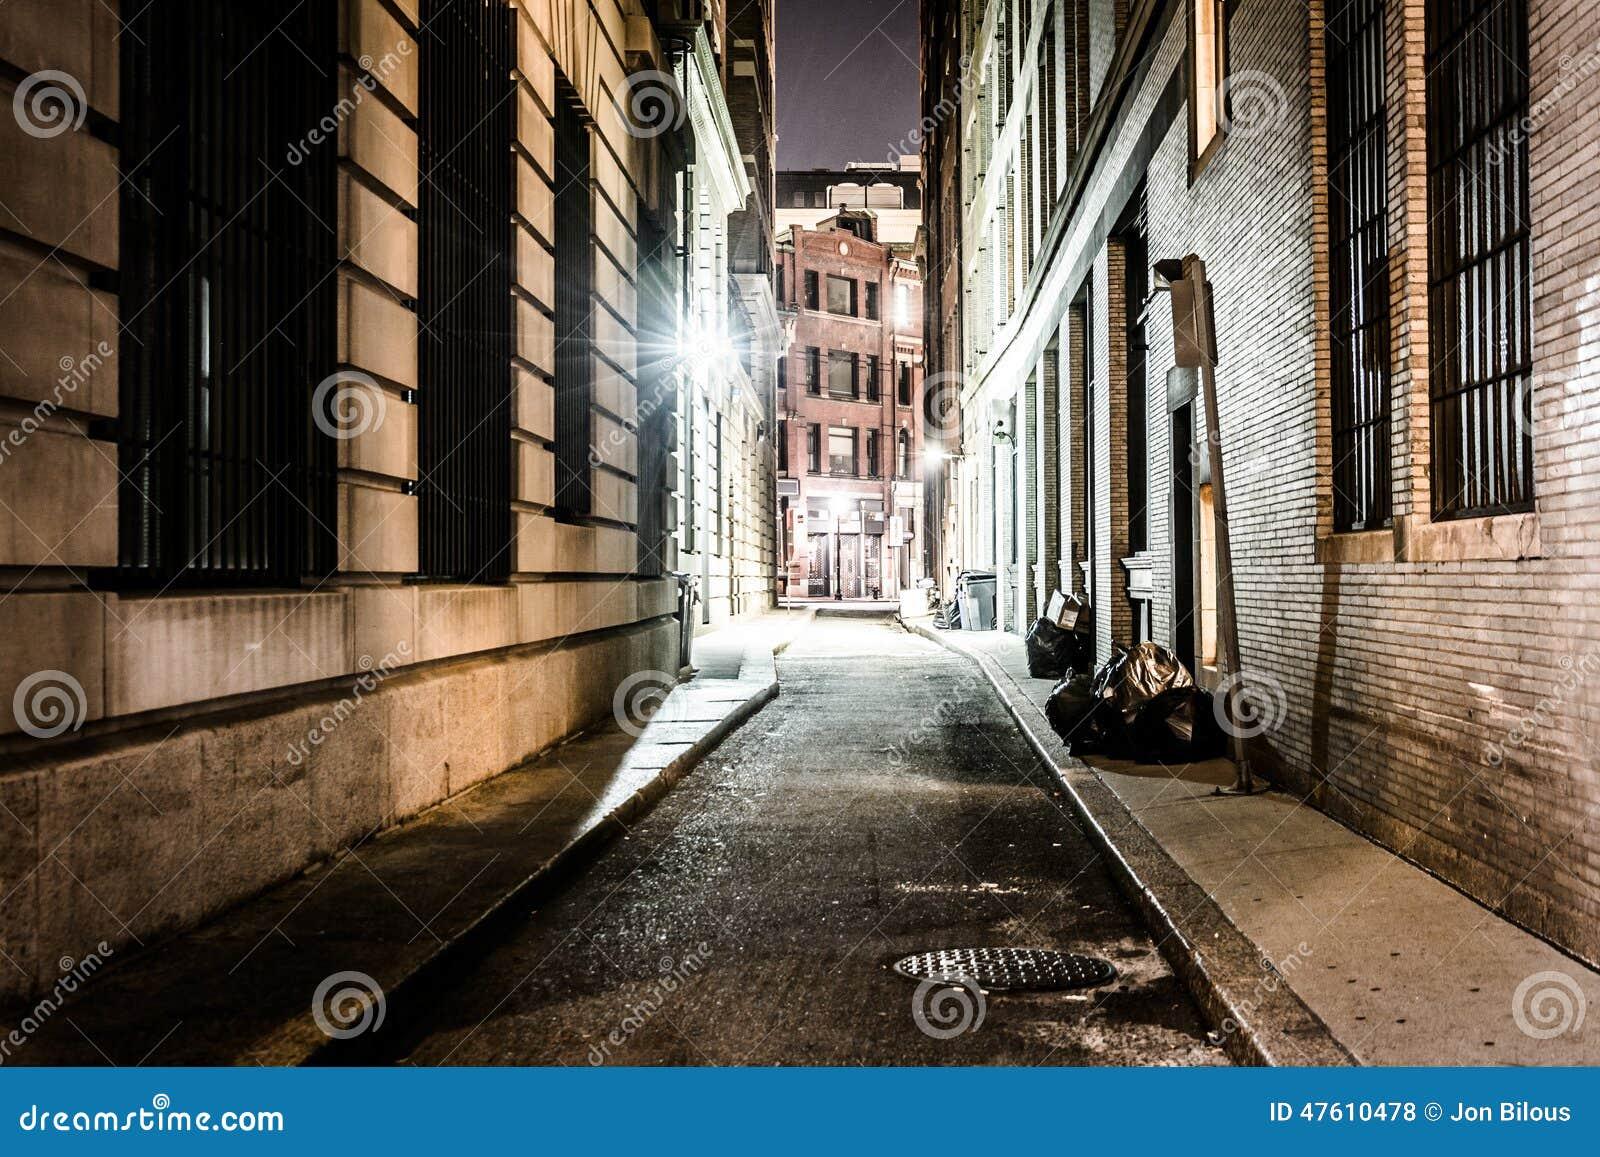 An alley at night, in Boston, Massachusetts.